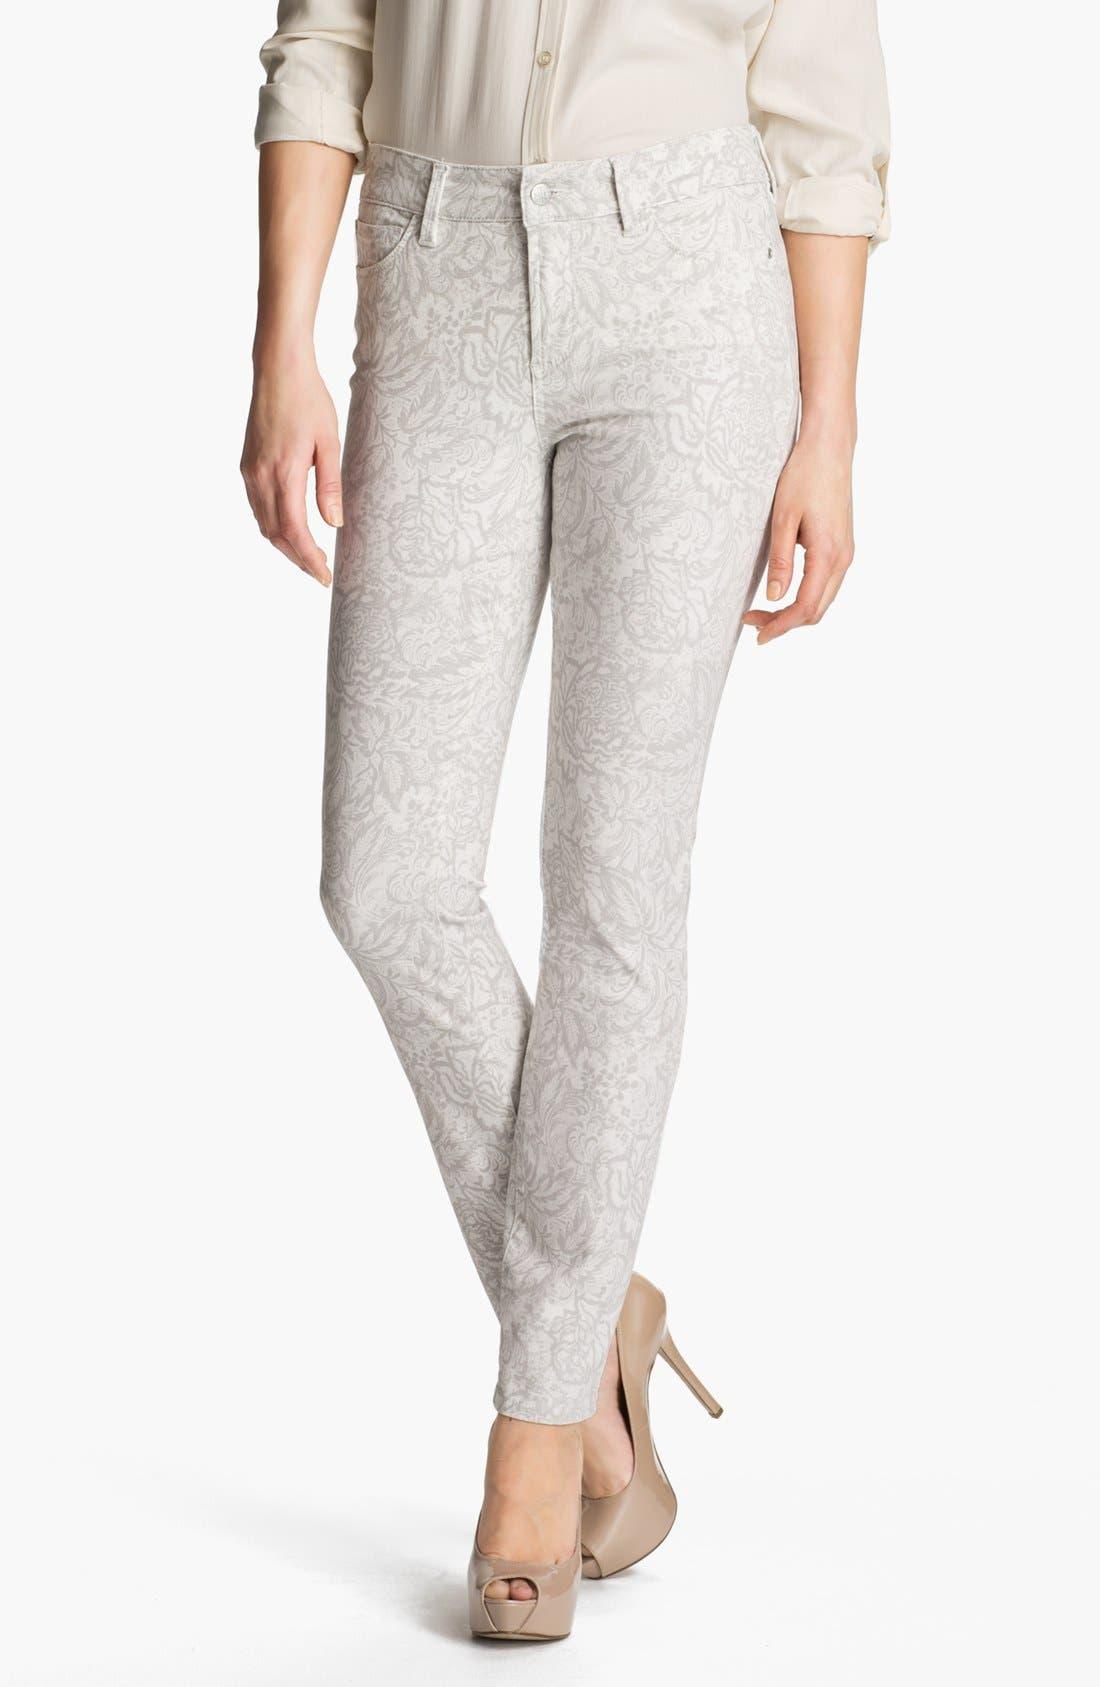 Alternate Image 1 Selected - NYDJ 'Alisha' Print Skinny Stretch Ankle Jeans (Petite)